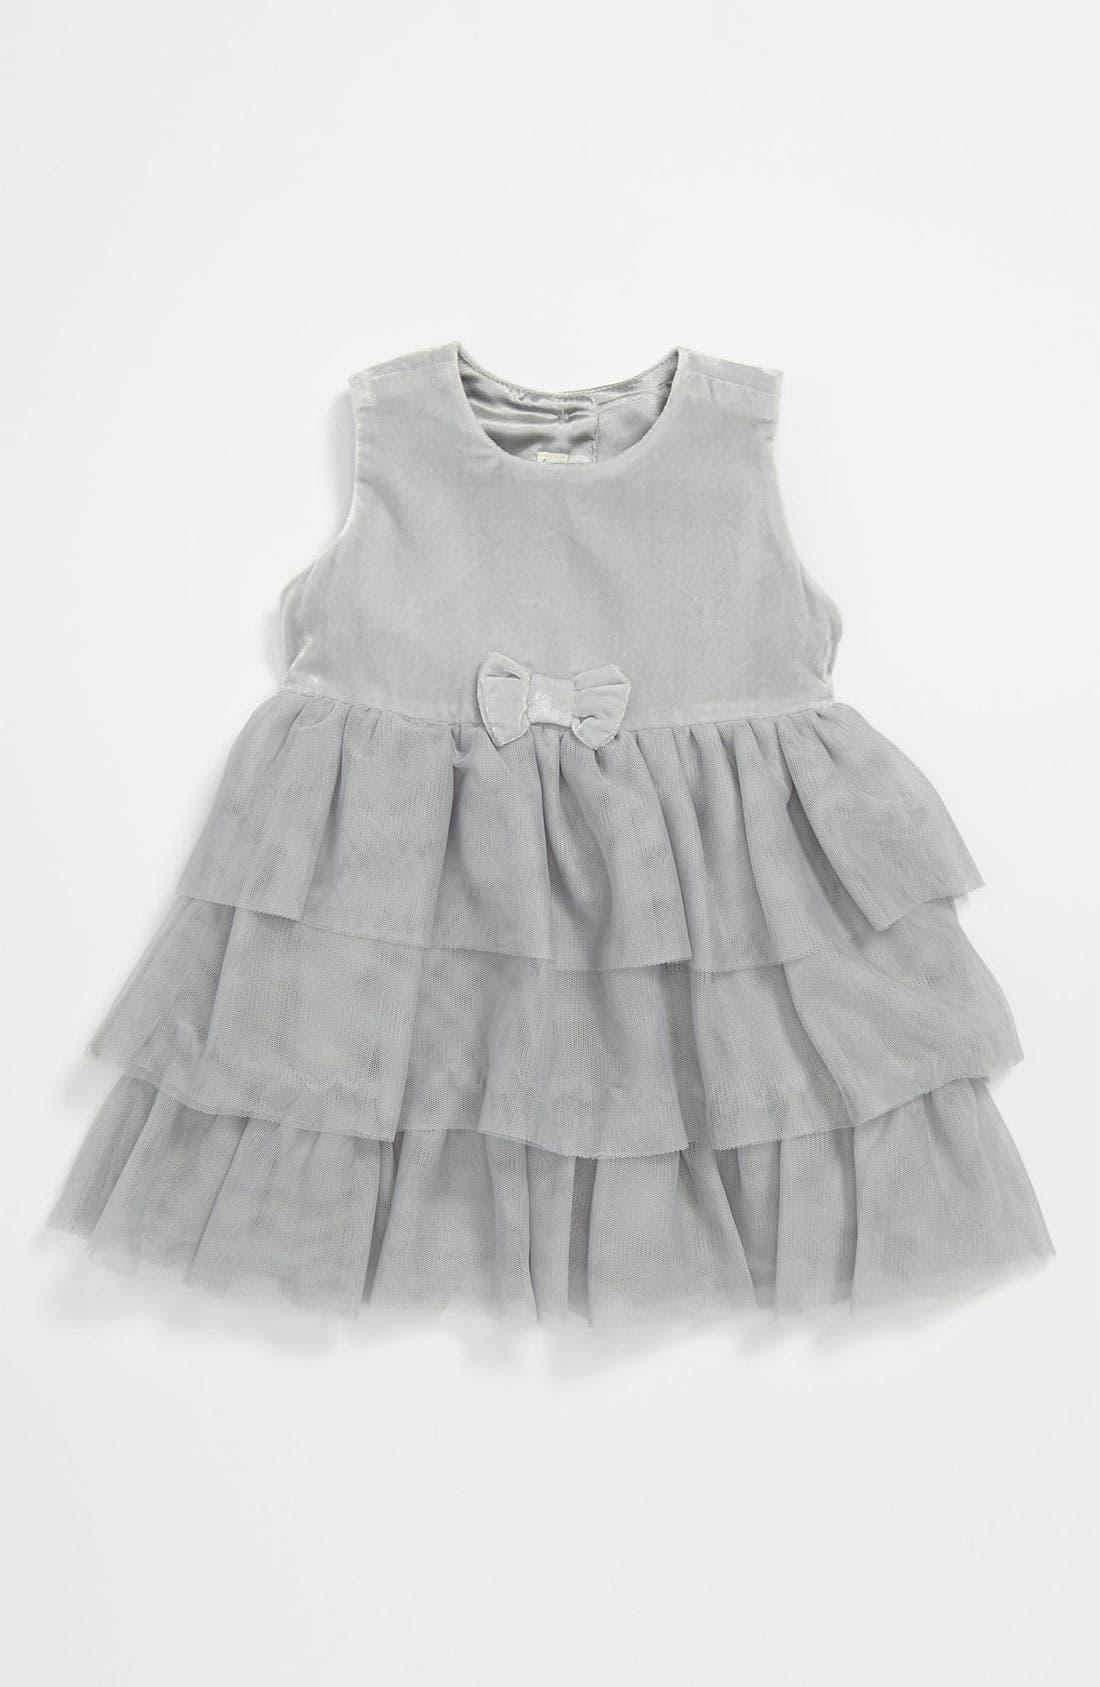 Main Image - United Colors of Benetton Kids Ruffle Dress (Infant)